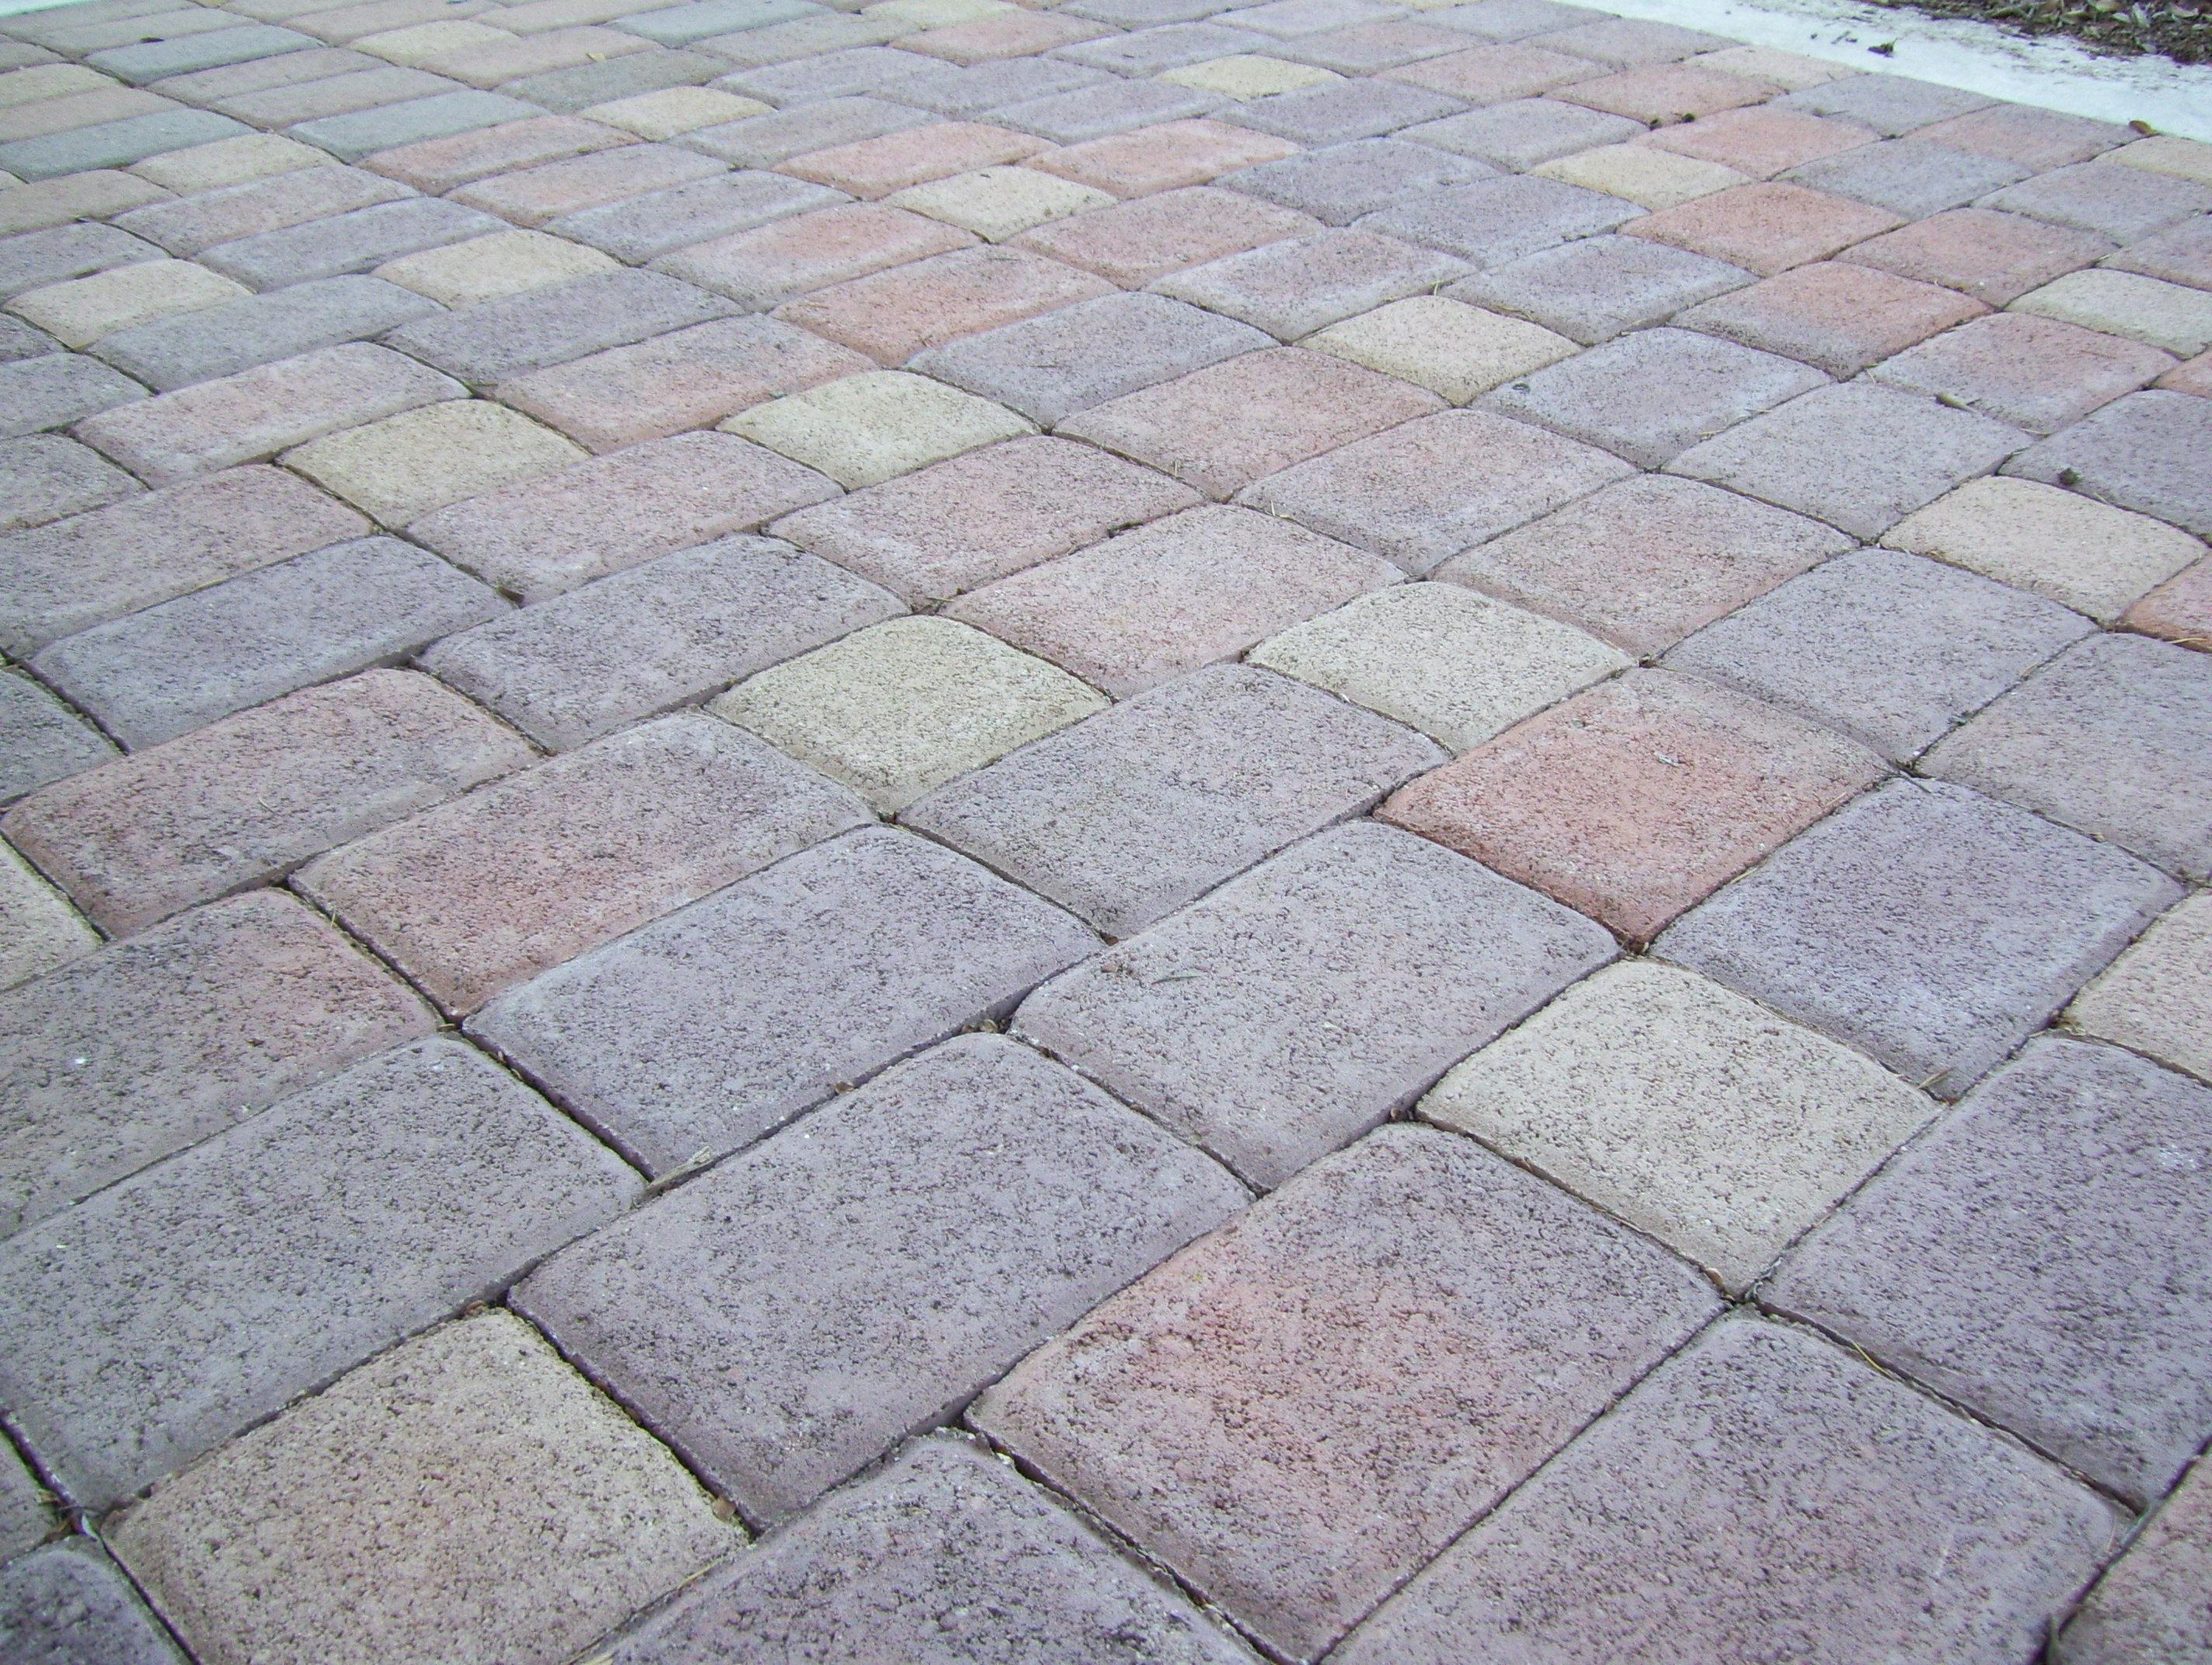 paver stones 100_1293 RNTOQVC